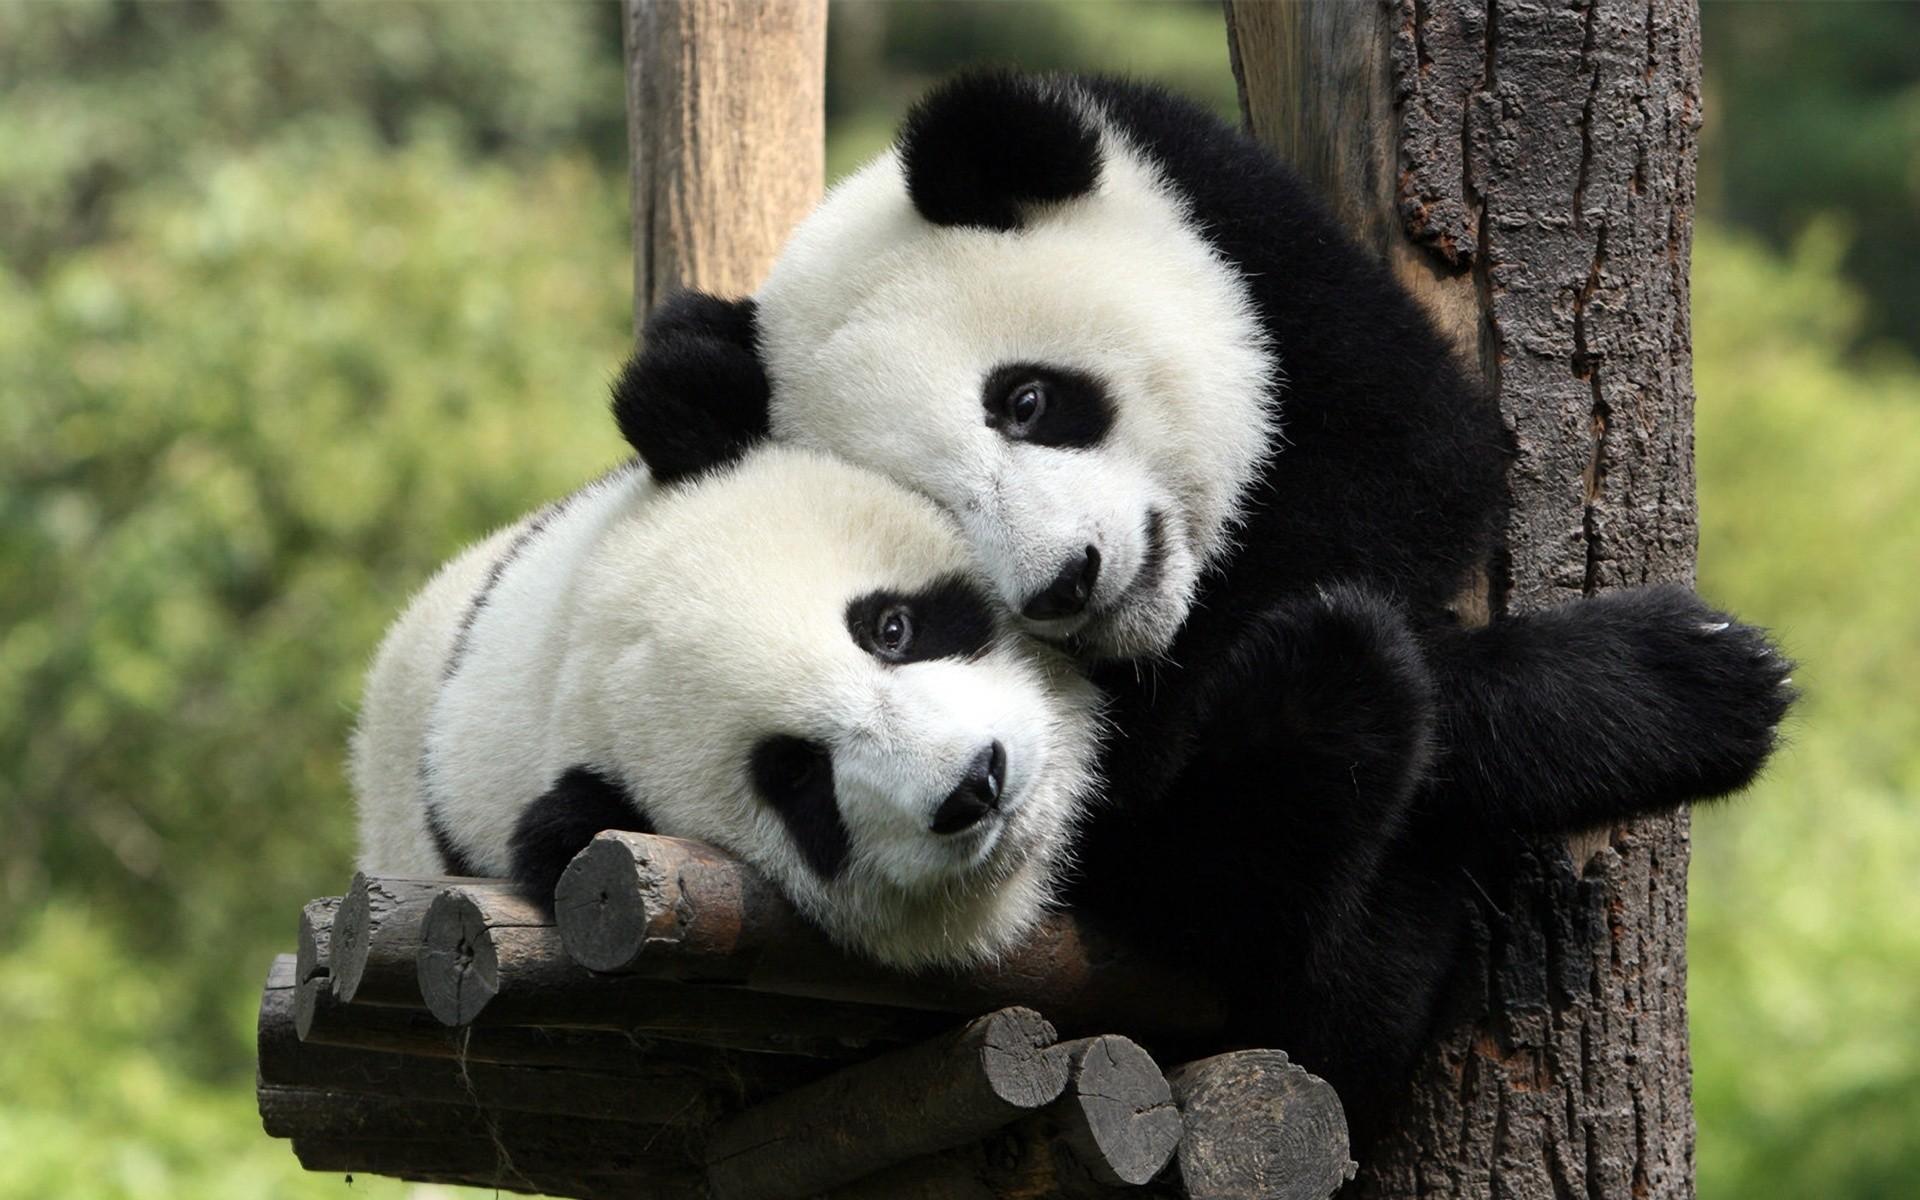 hinh gau truc panda 11